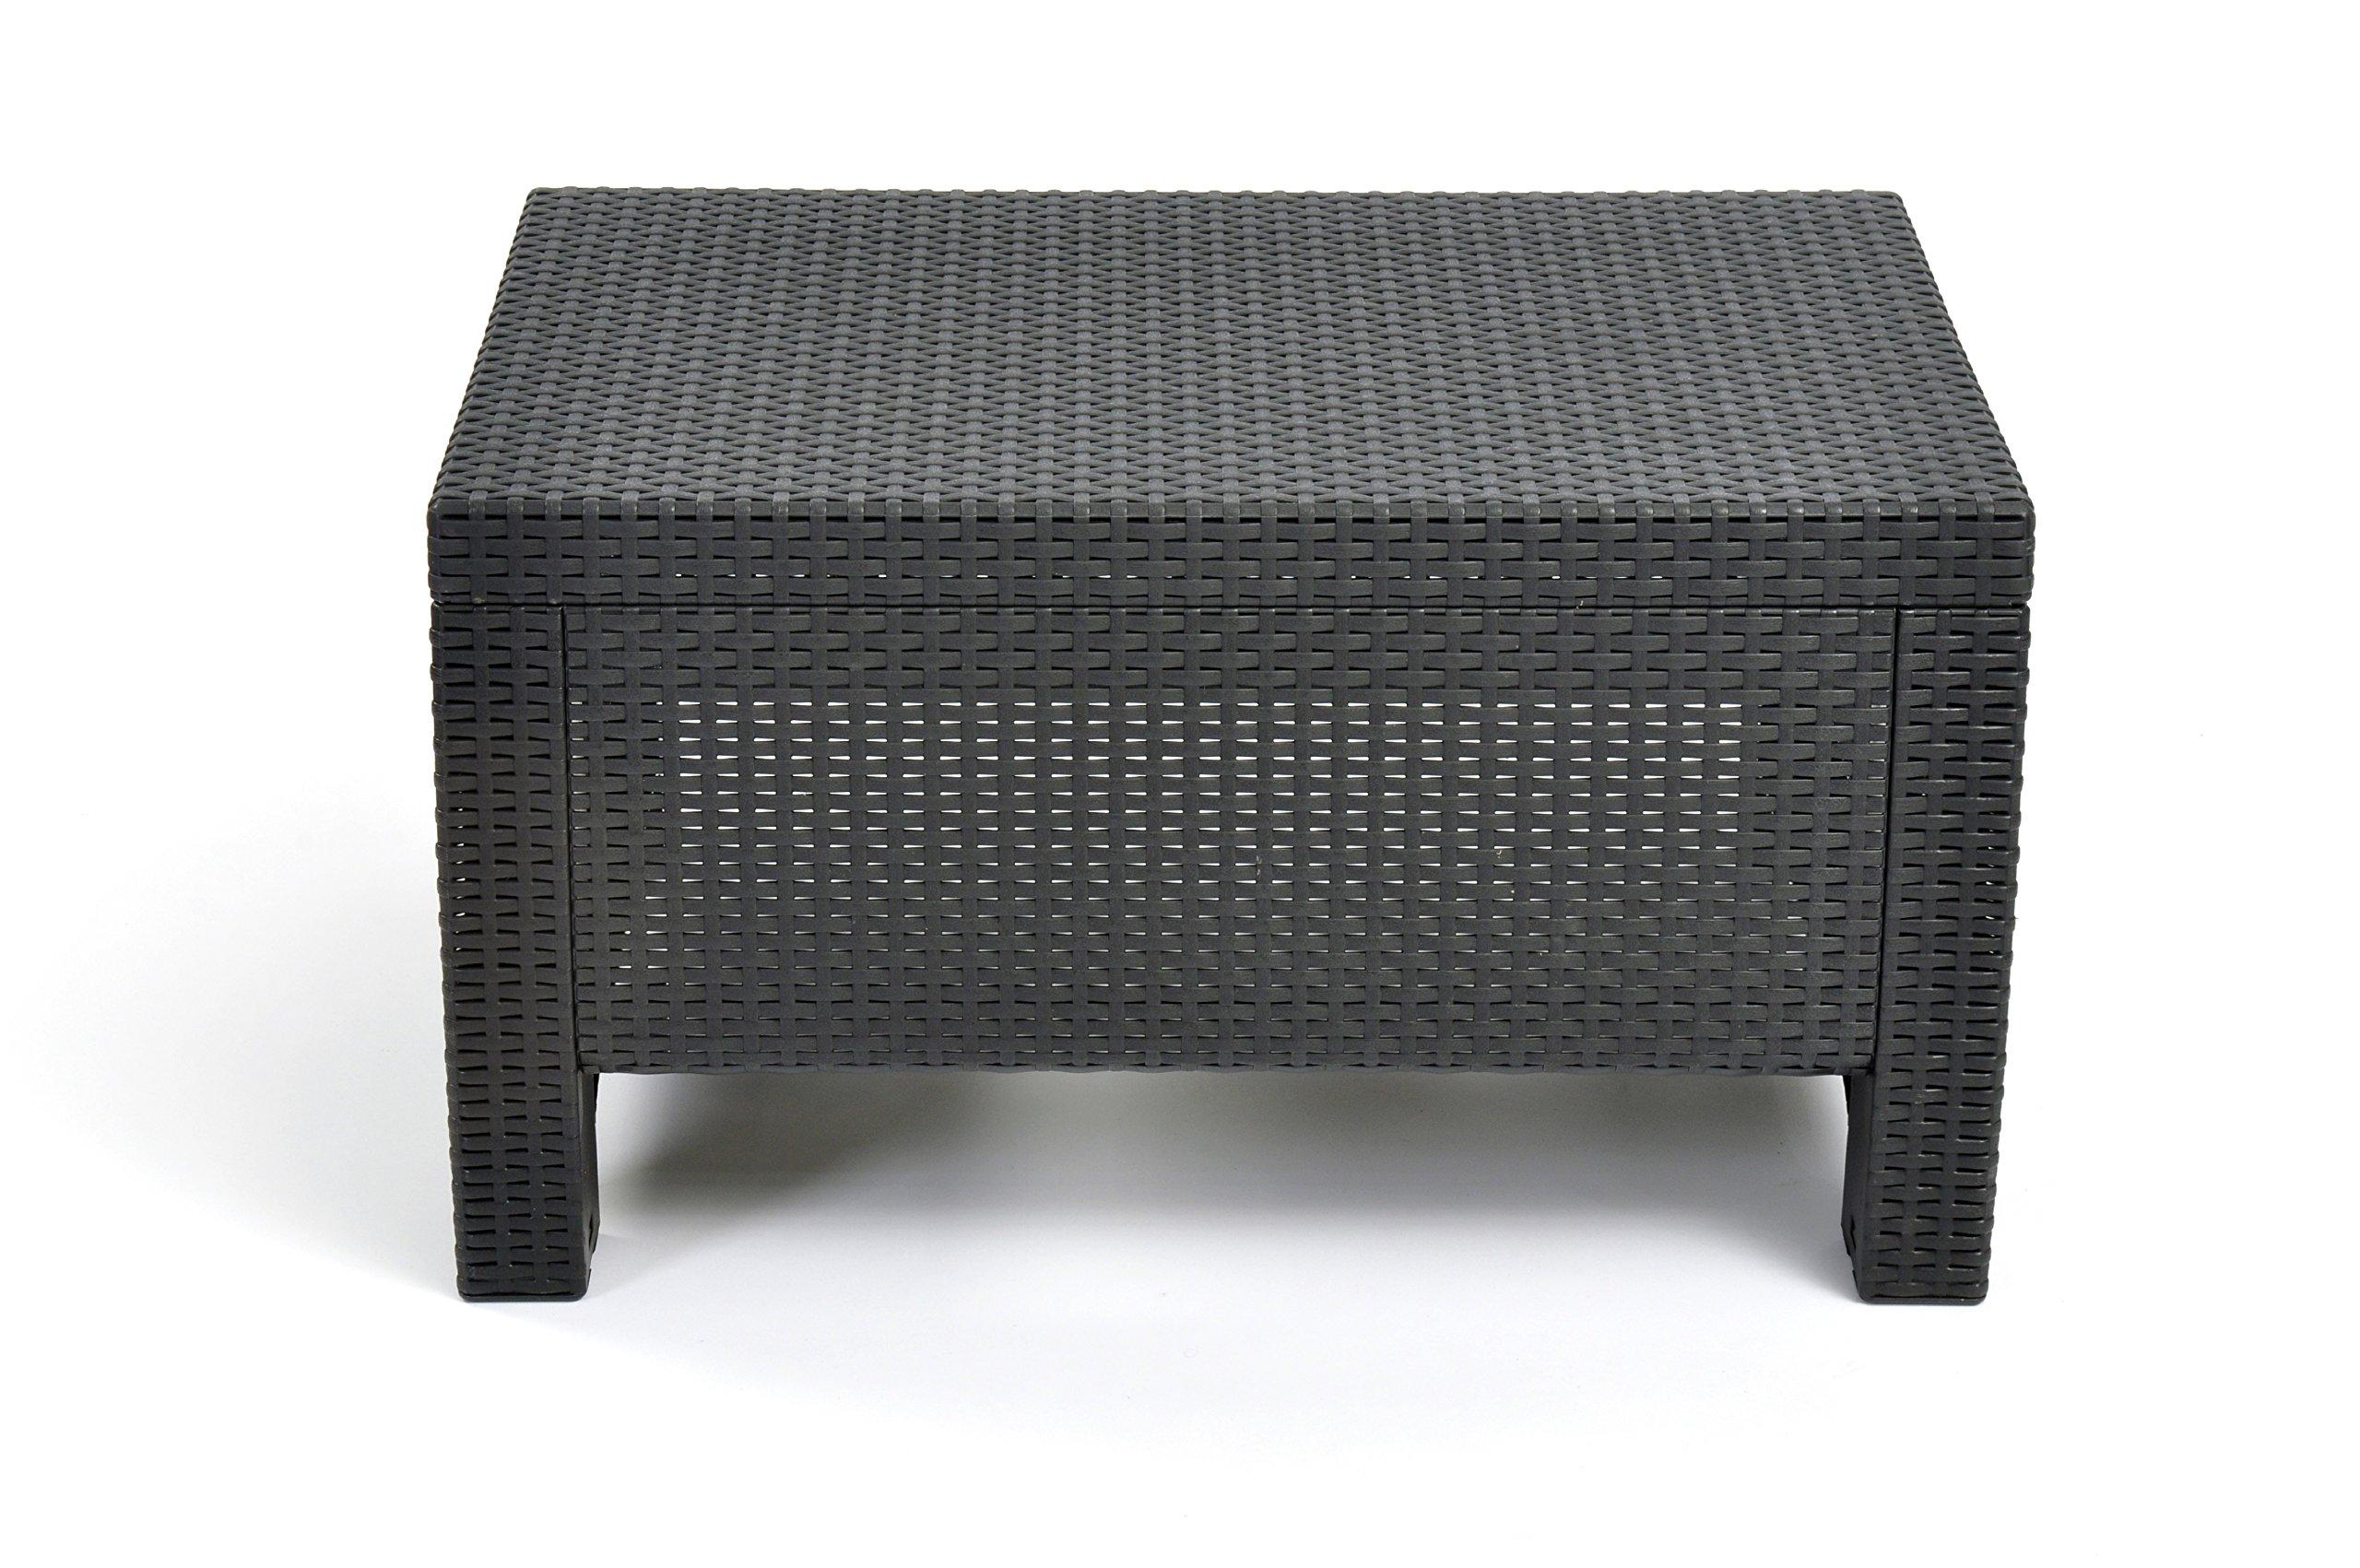 Keter Corfu Coffee Table Modern All Weather Outdoor Patio Garden Backyard Furniture, Charcoal product image